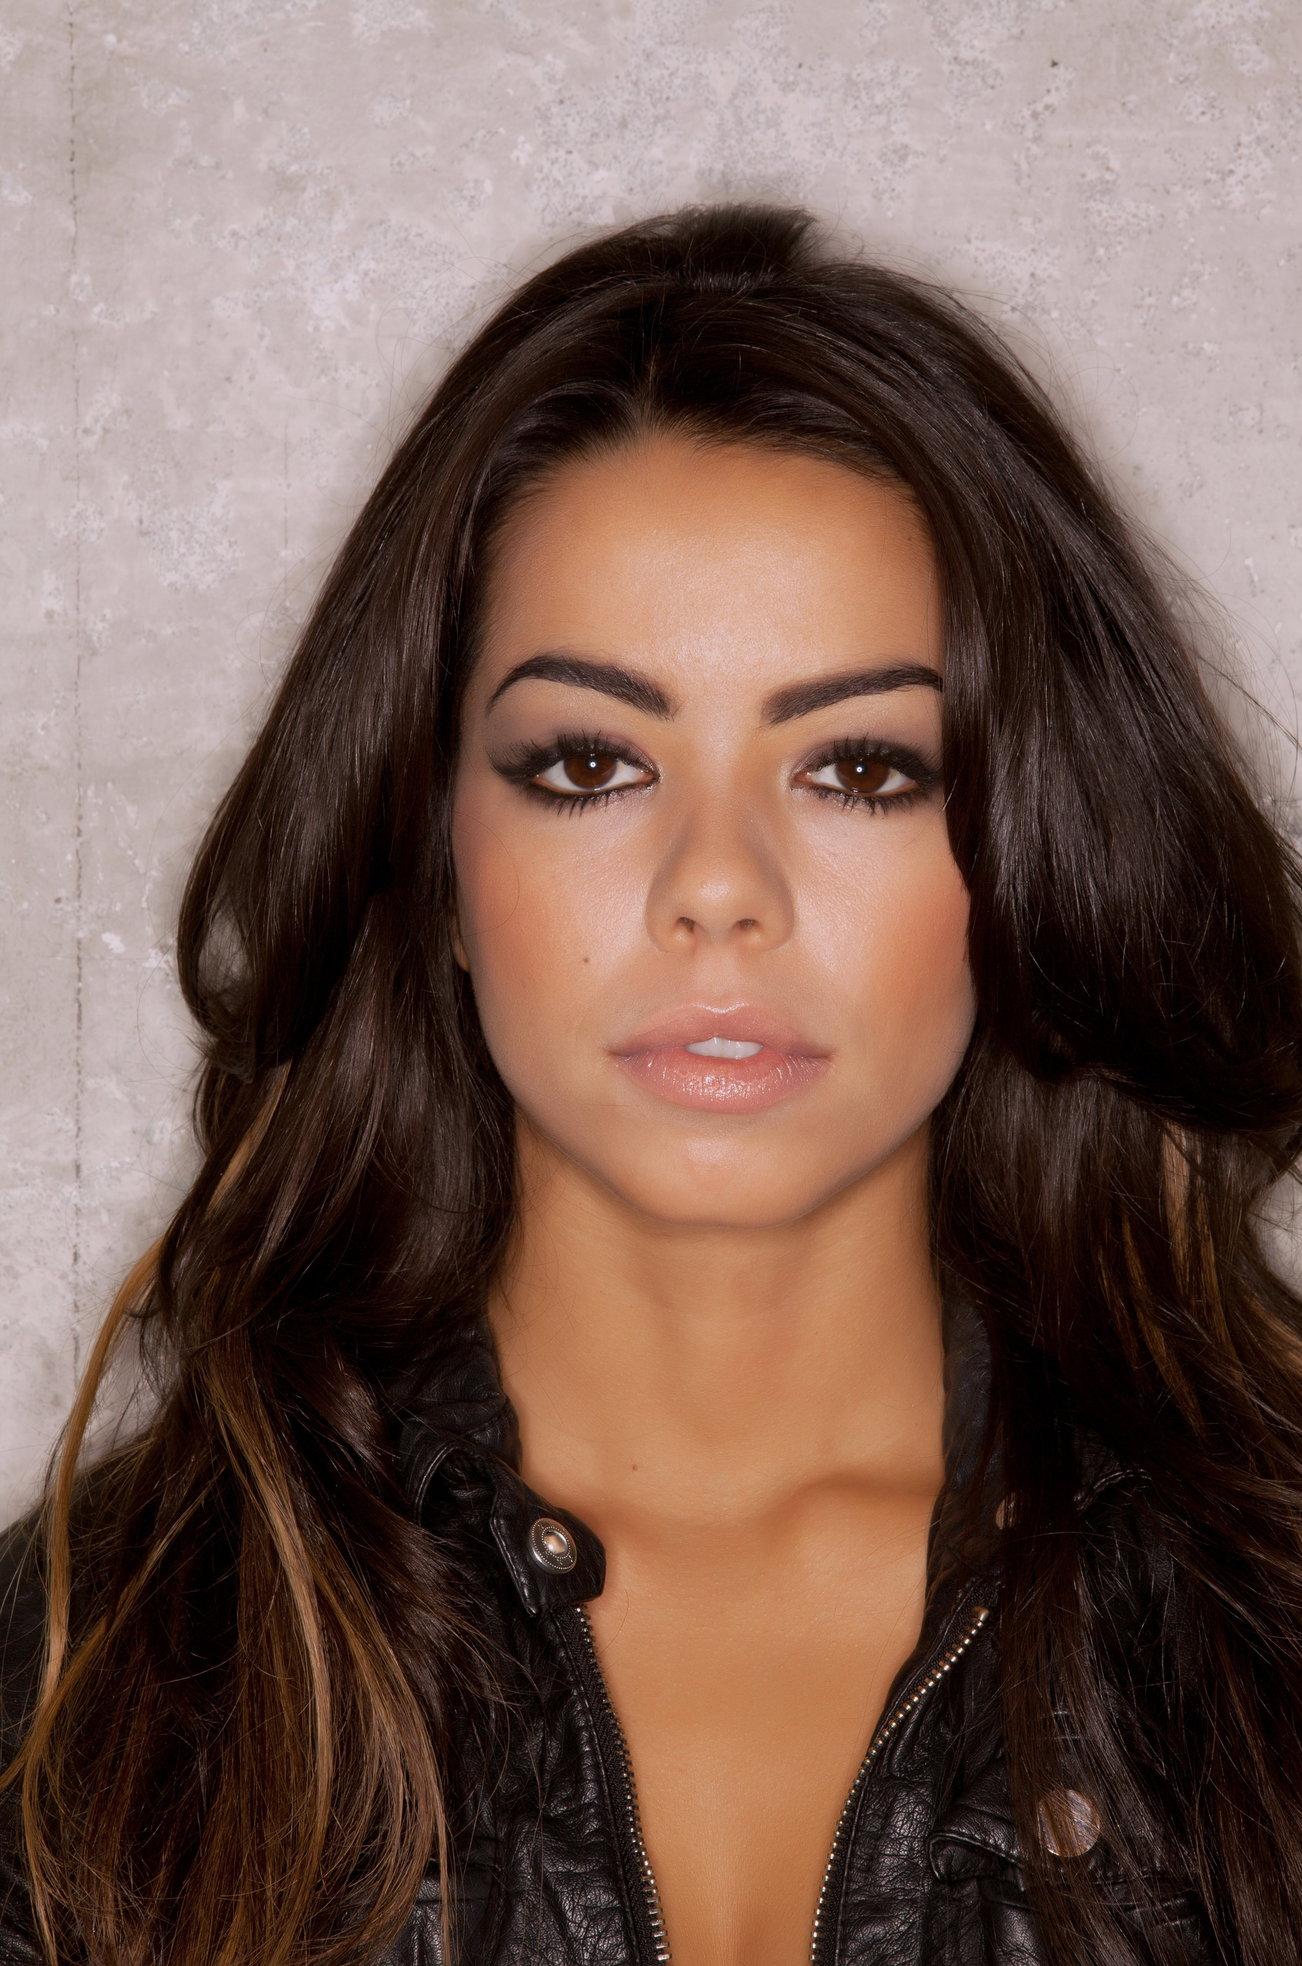 Fernanda Brandao in a phoot shoot from 2011